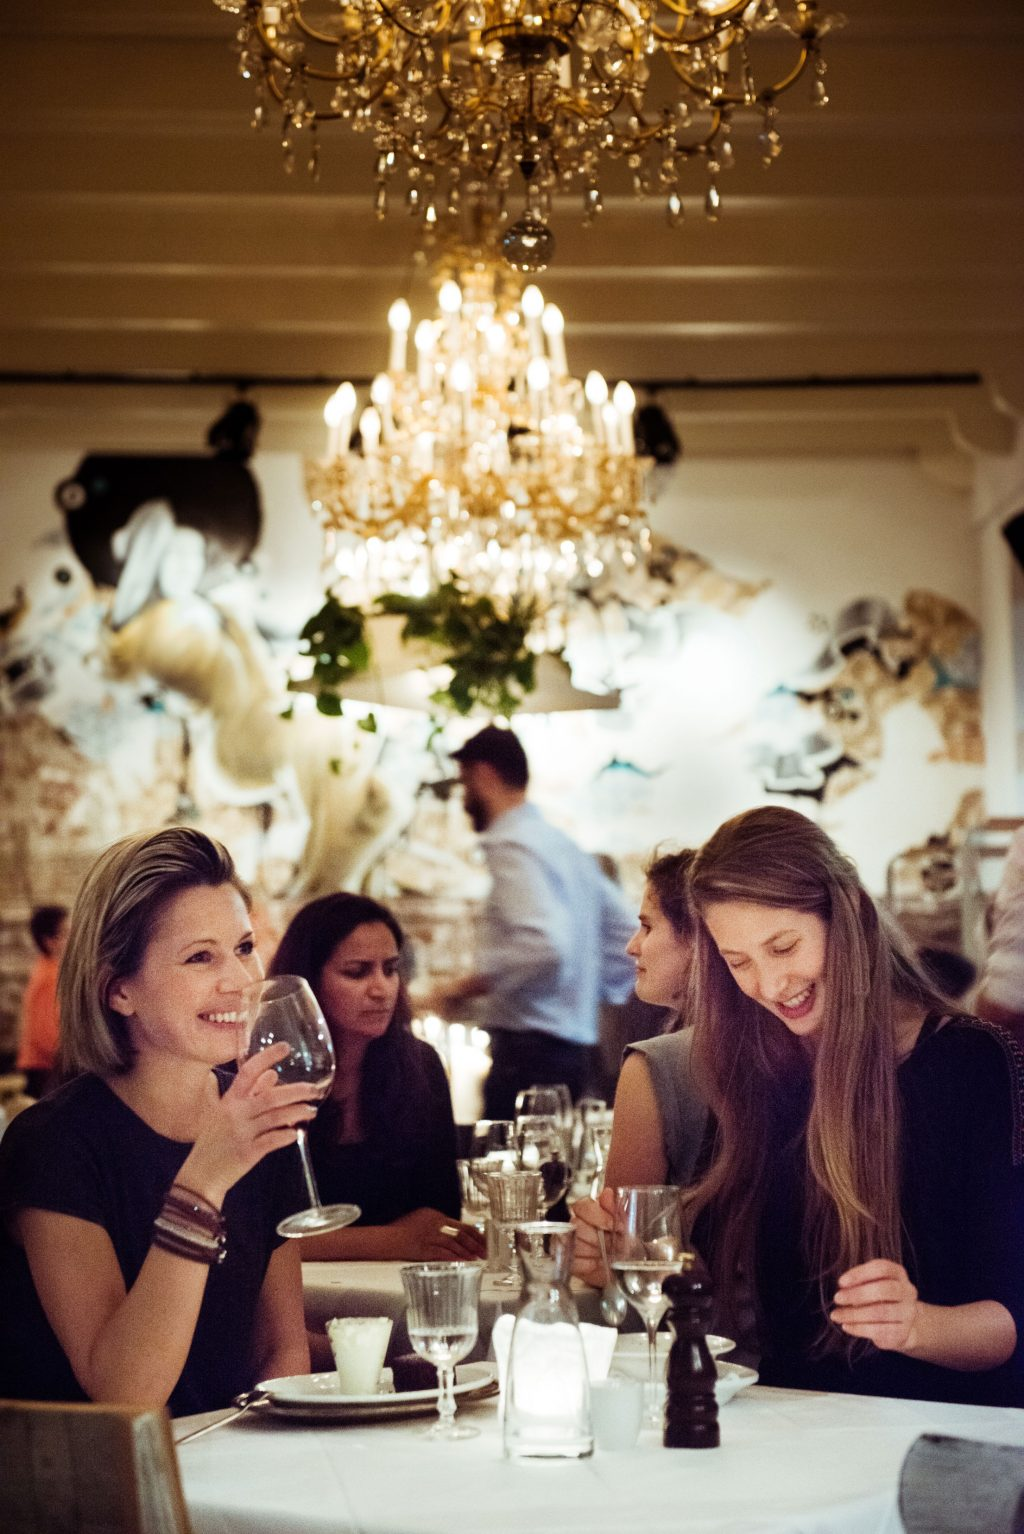 Der Speisesaal © Der Speisesaal